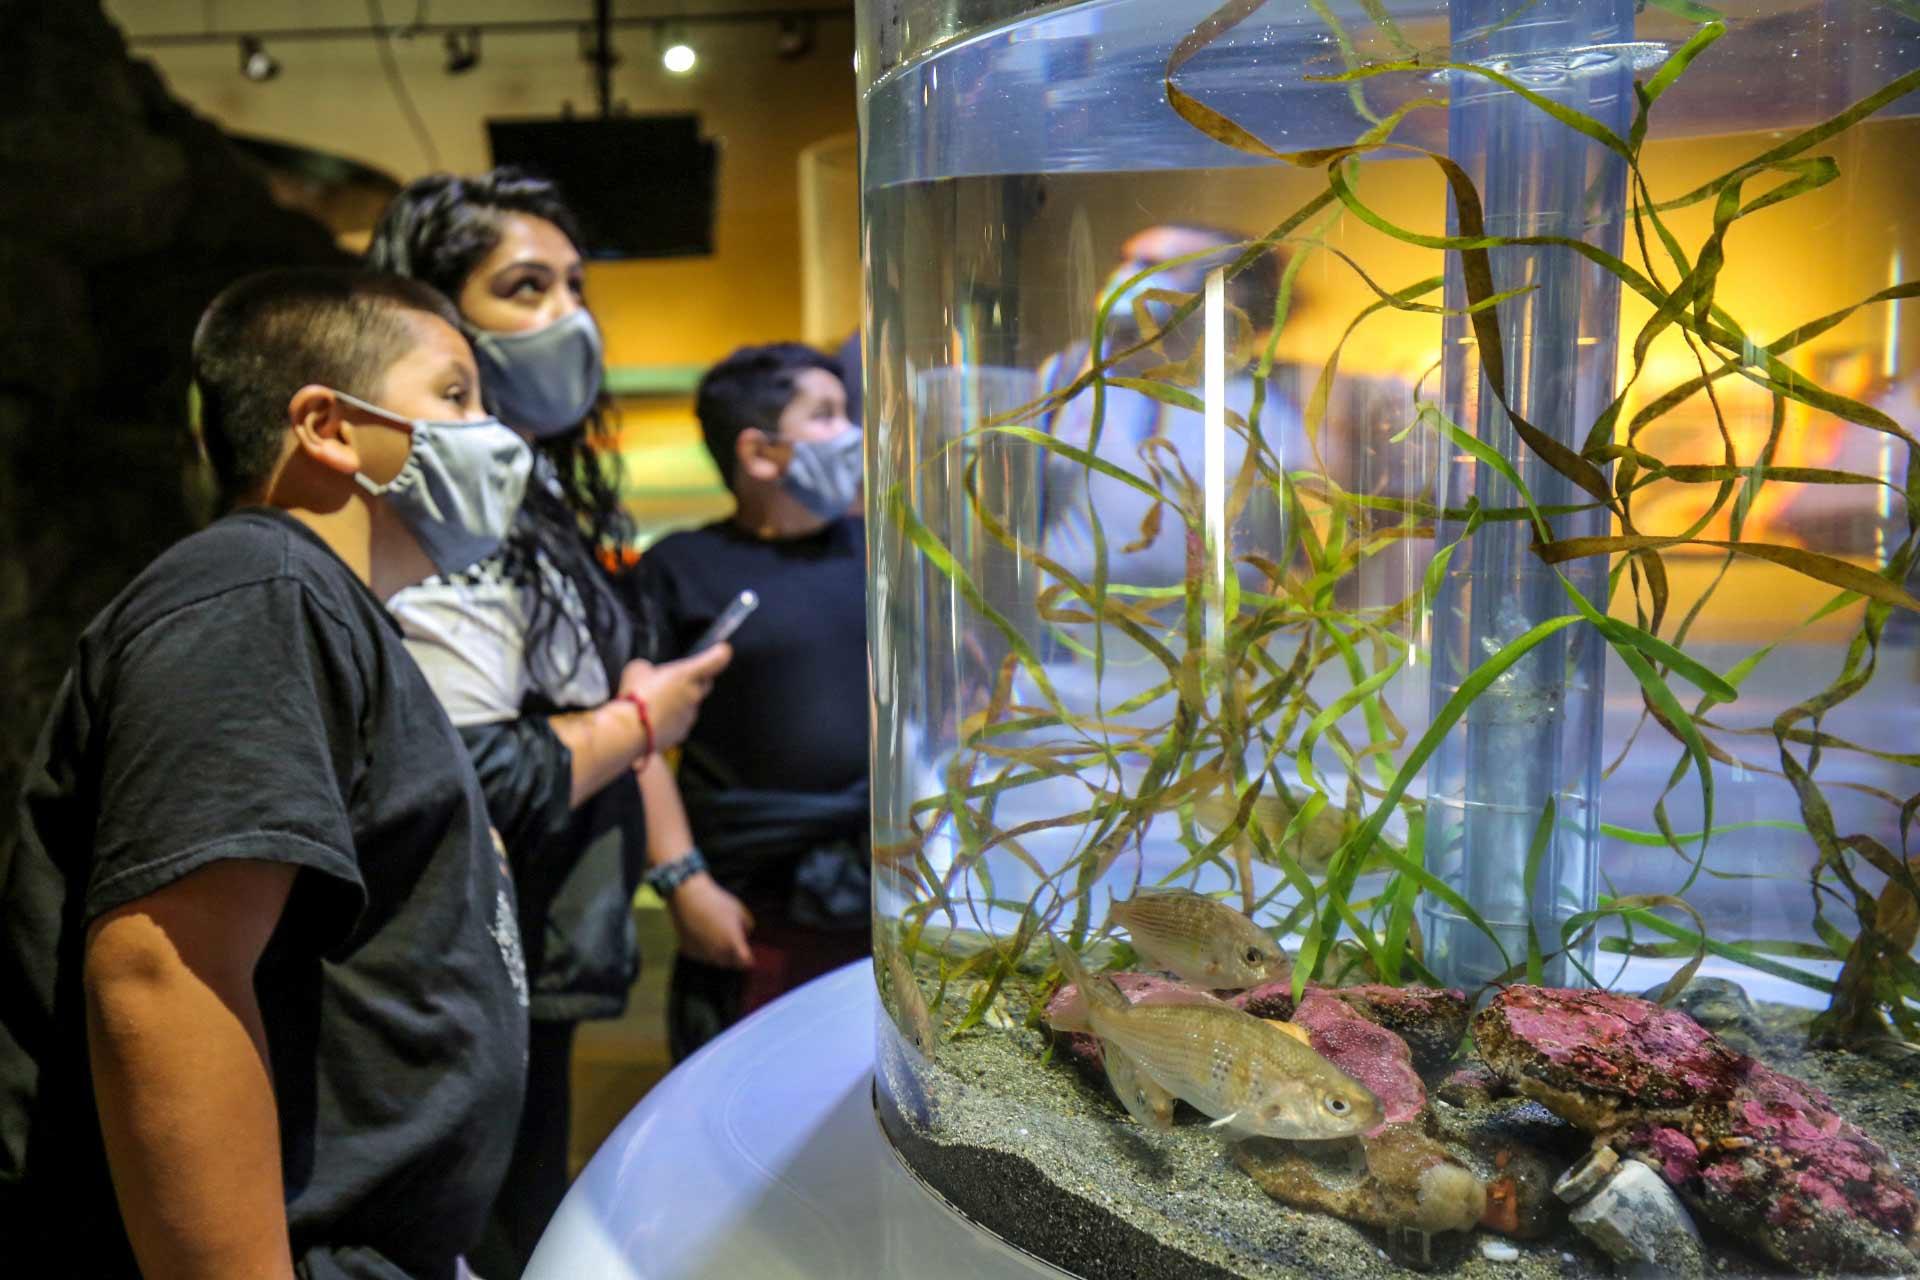 A family looks at fish at Seattle Aquarium